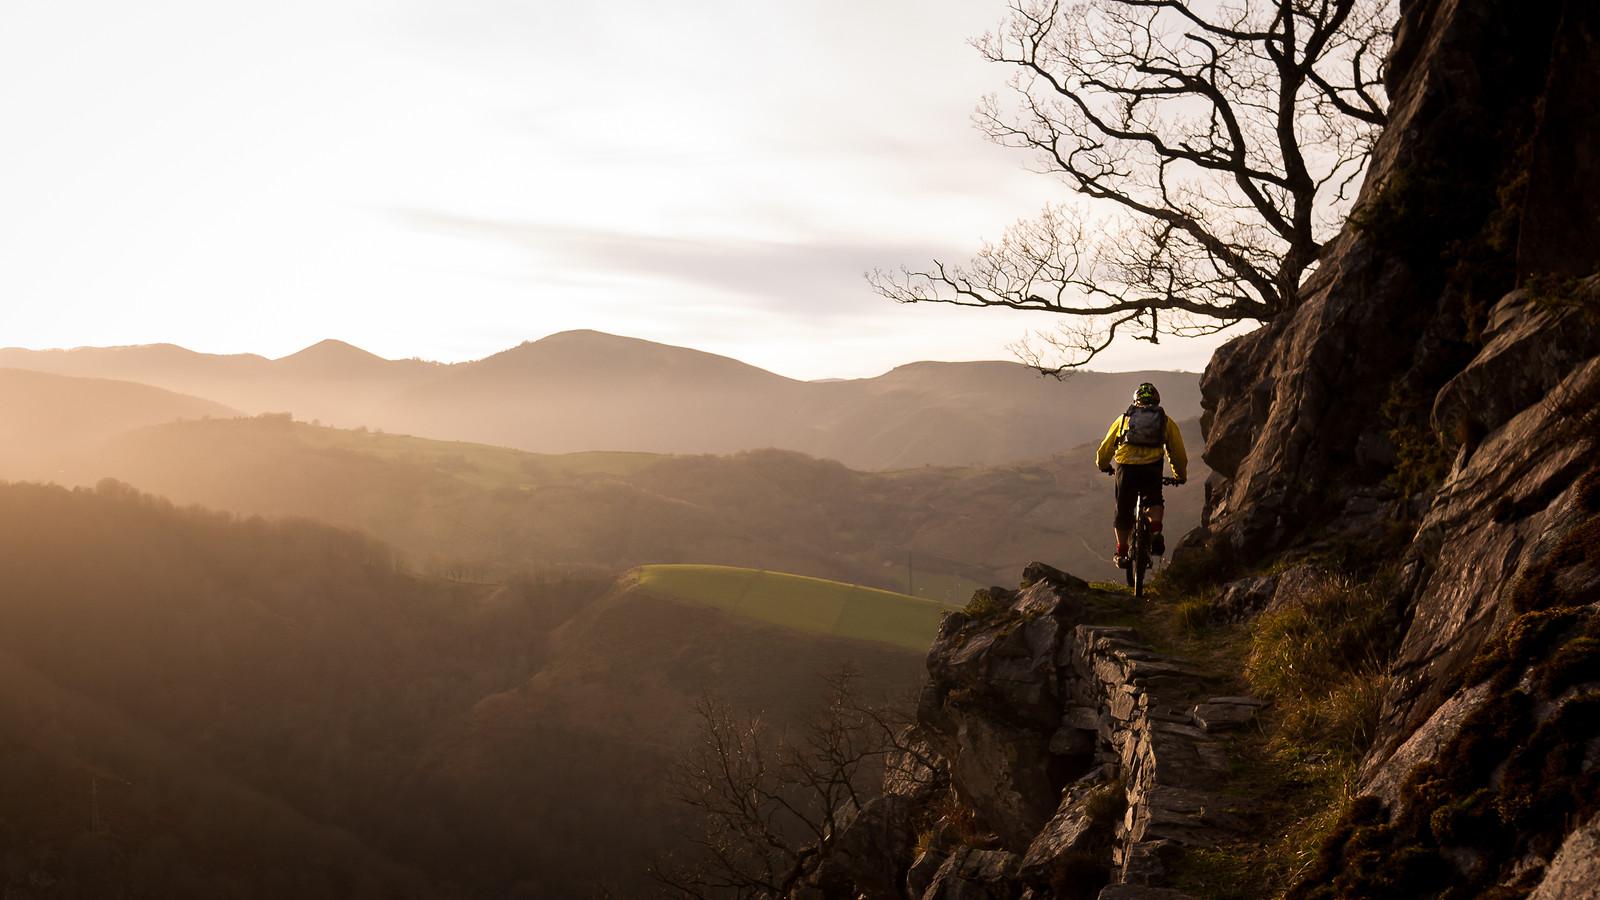 Sunset Trail Finding   - BasqueMTB - Mountain Biking Pictures - Vital MTB